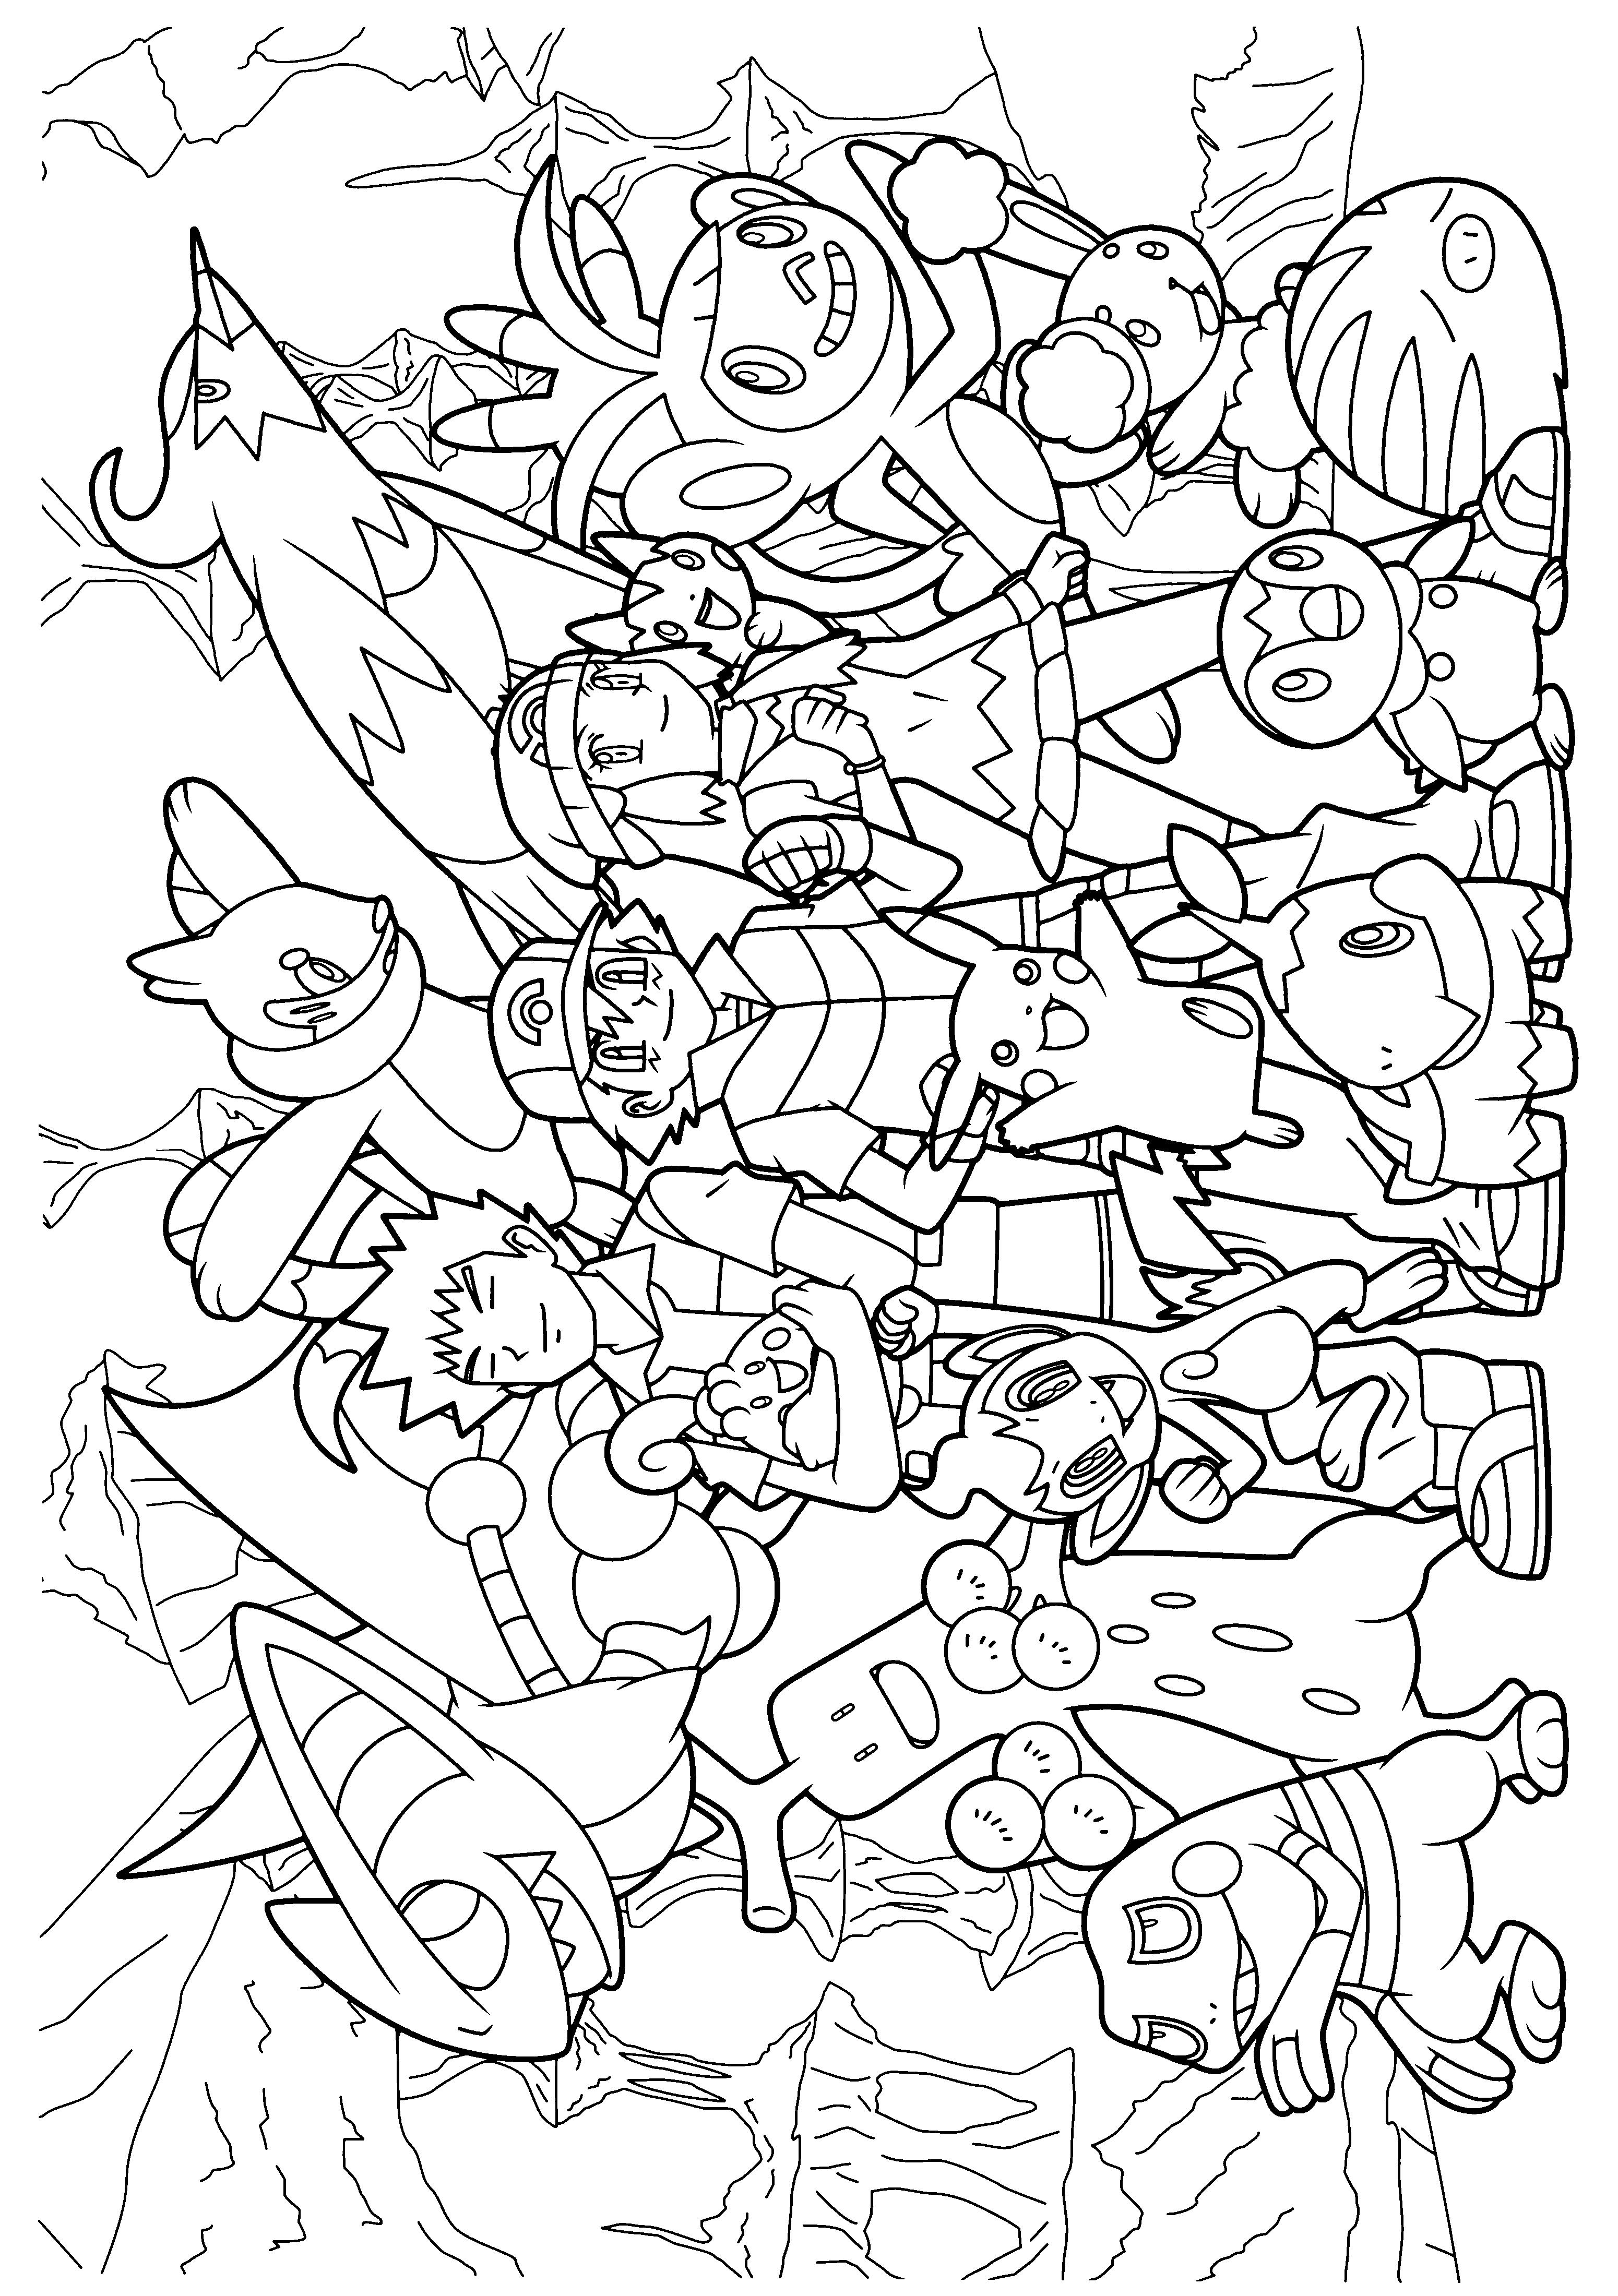 pokemon diamond pearl coloring pages | ぬりえ | ぬり絵, ポケモン, 塗り絵